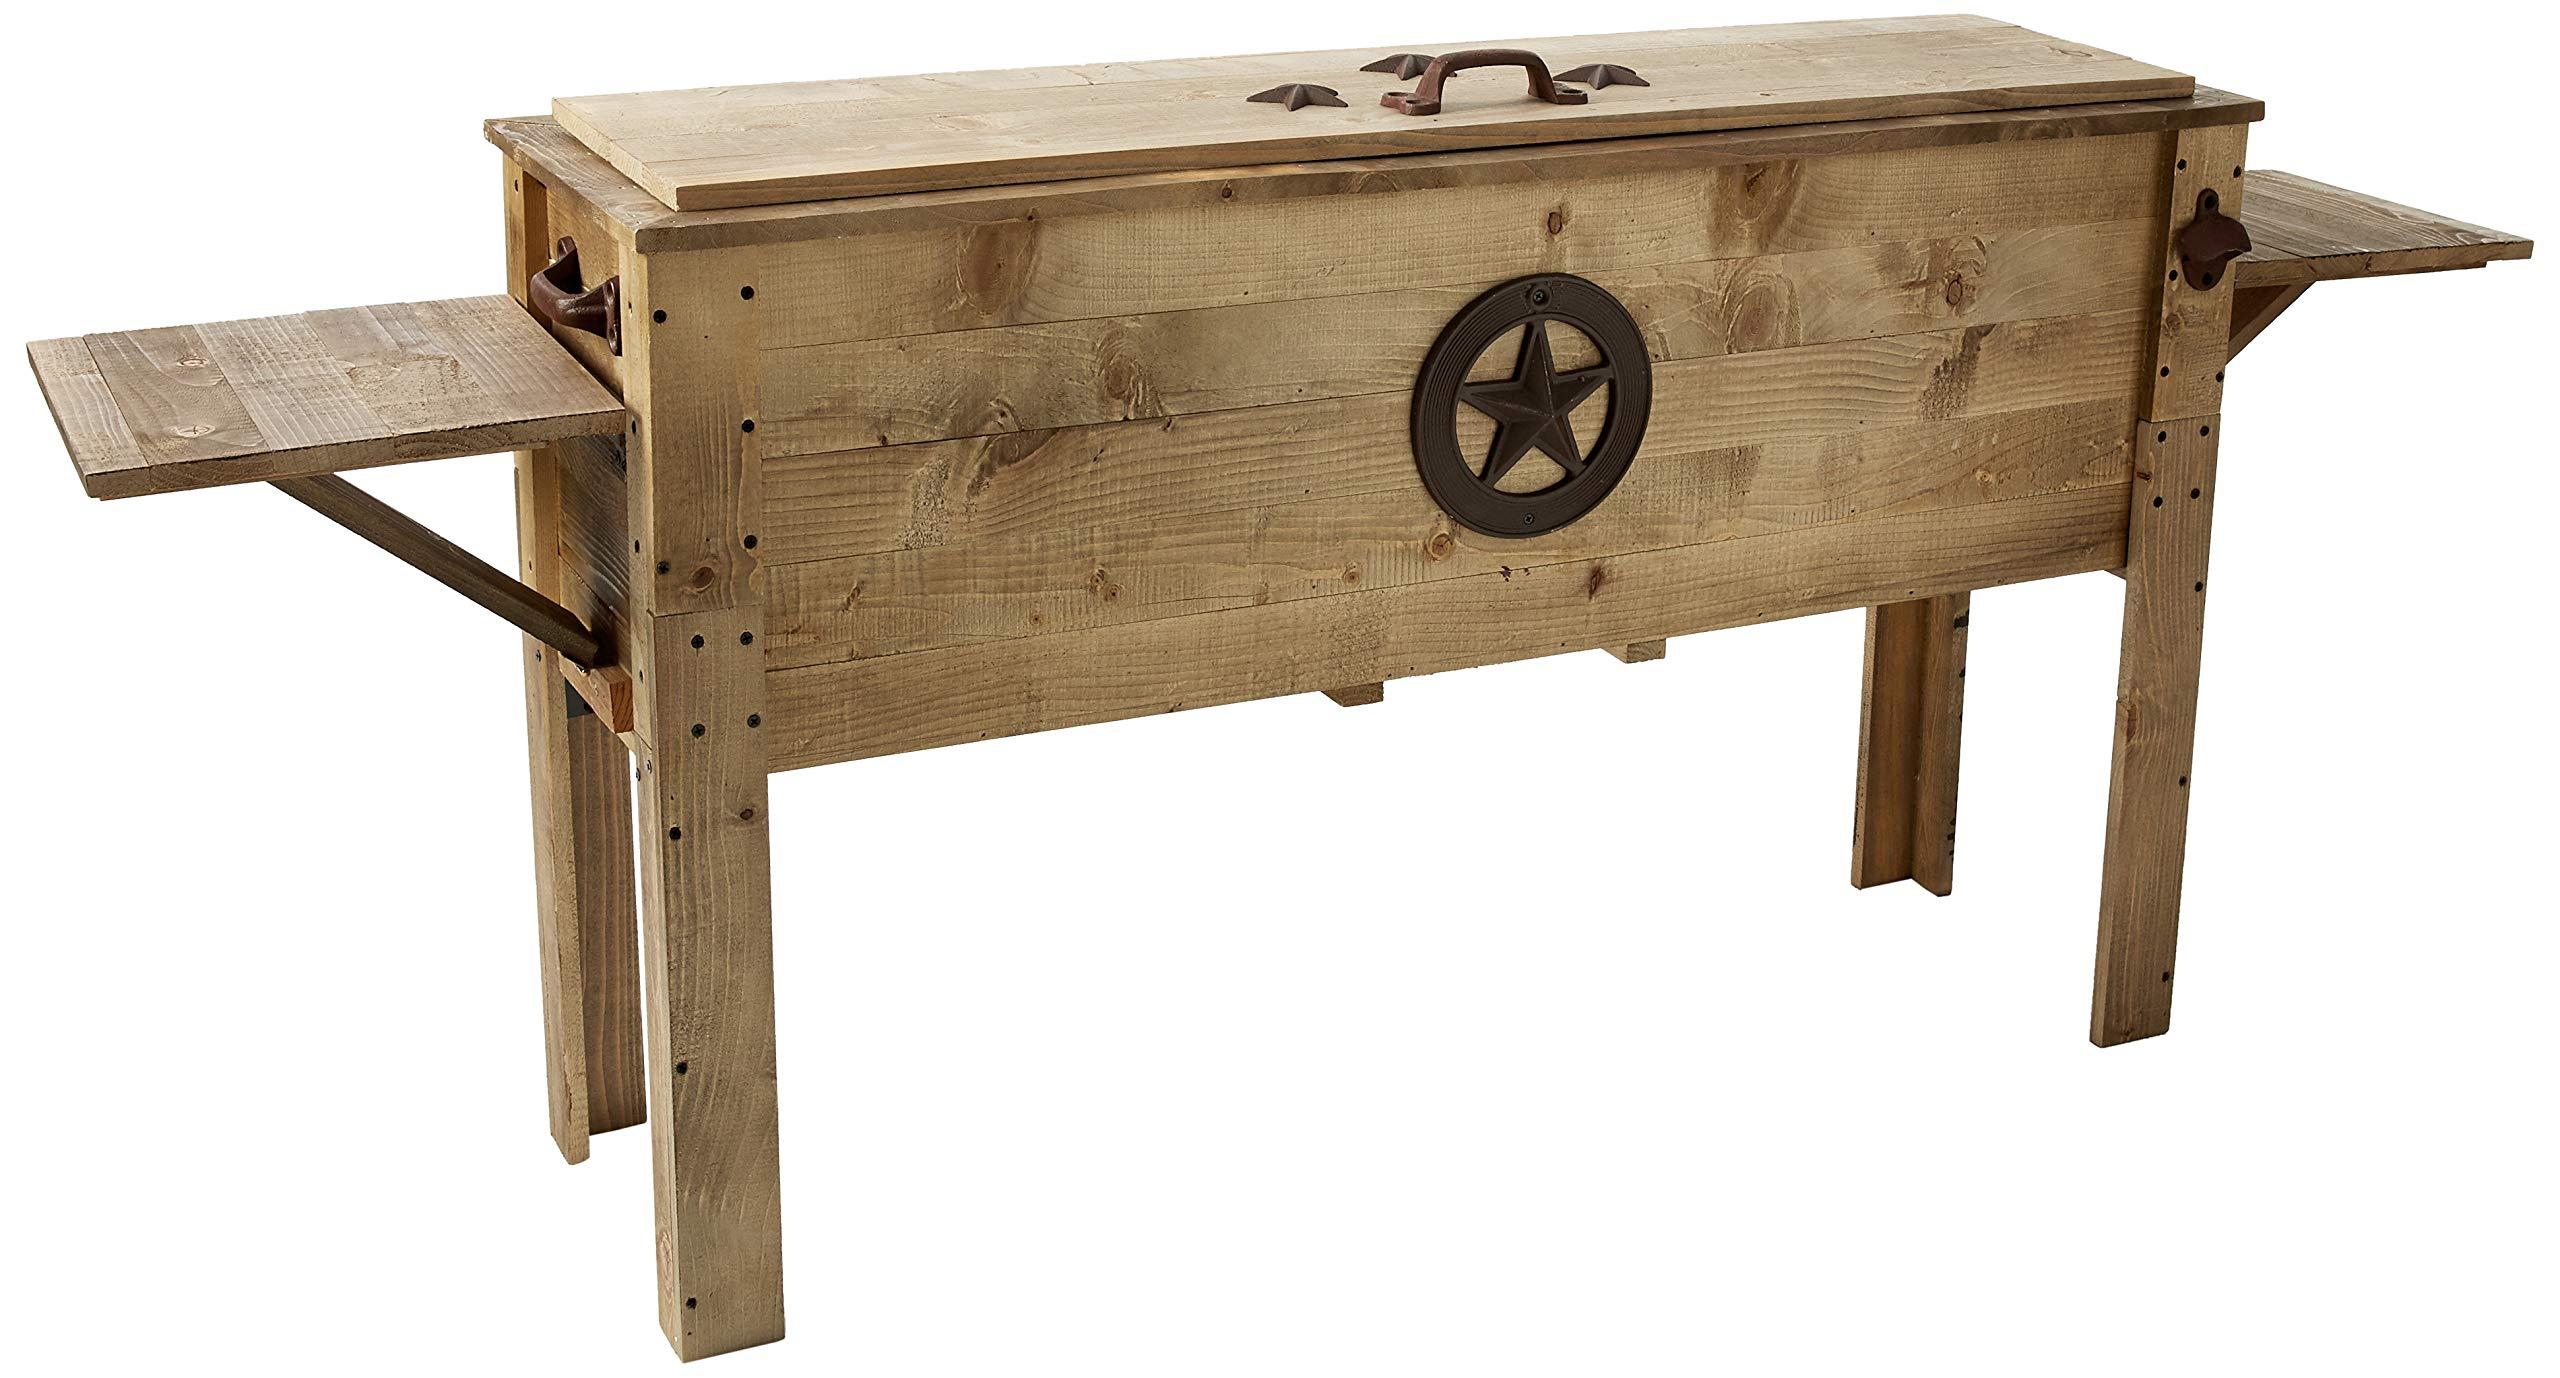 Backyard Expressions 913284 Decorative Outdoor Wooden Cooler, 87 quart, Brown